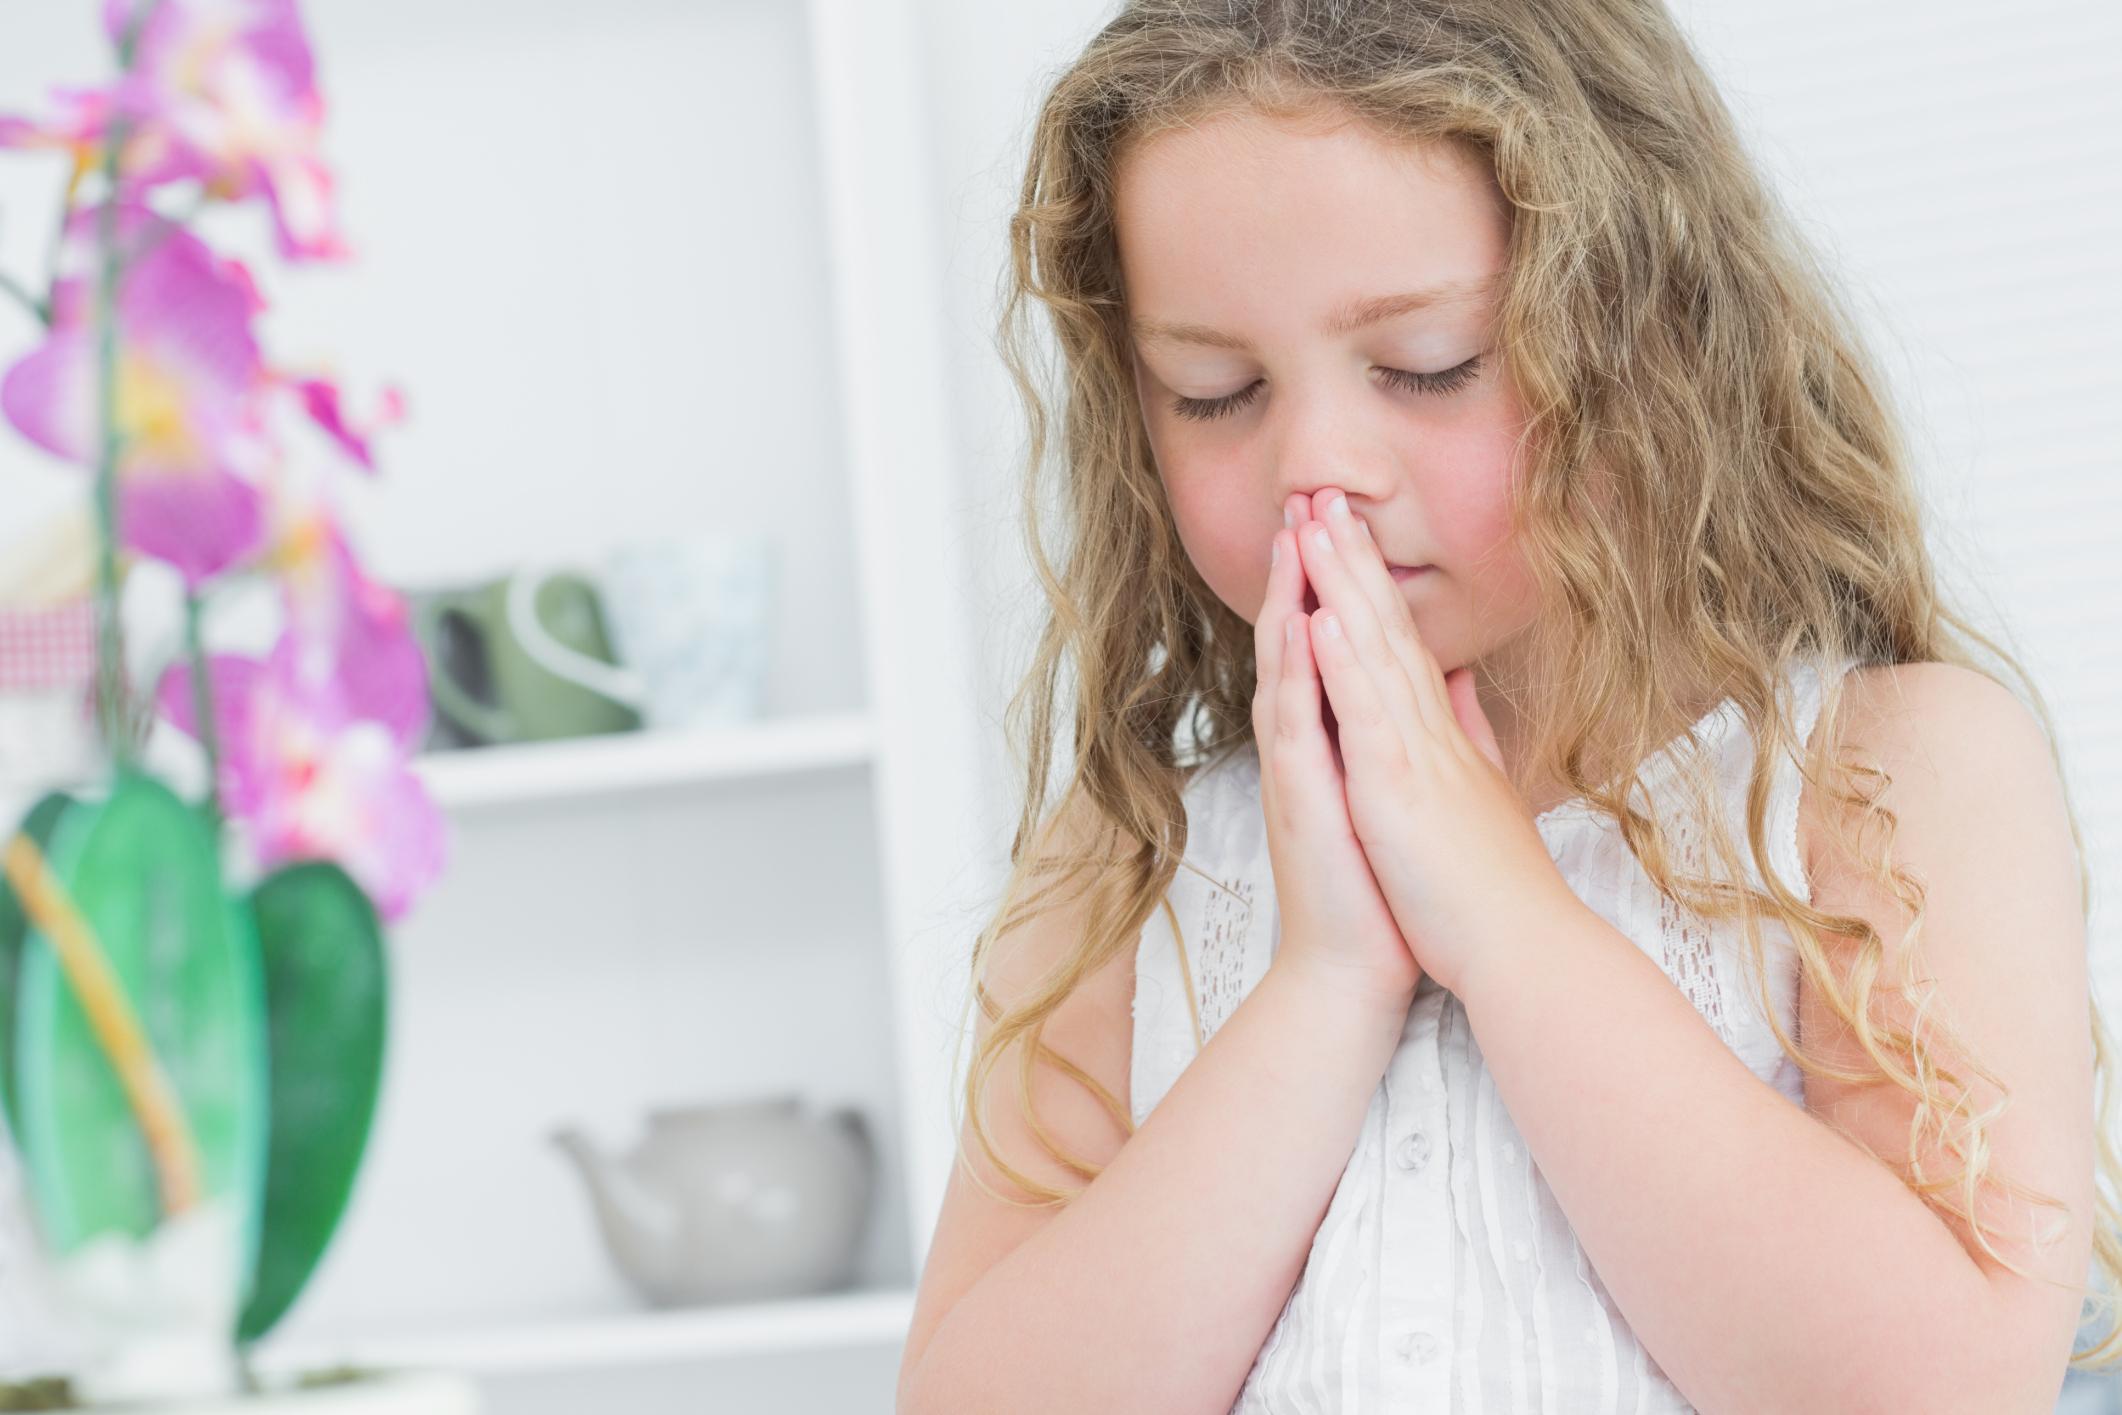 Sunday School Games About Prayer